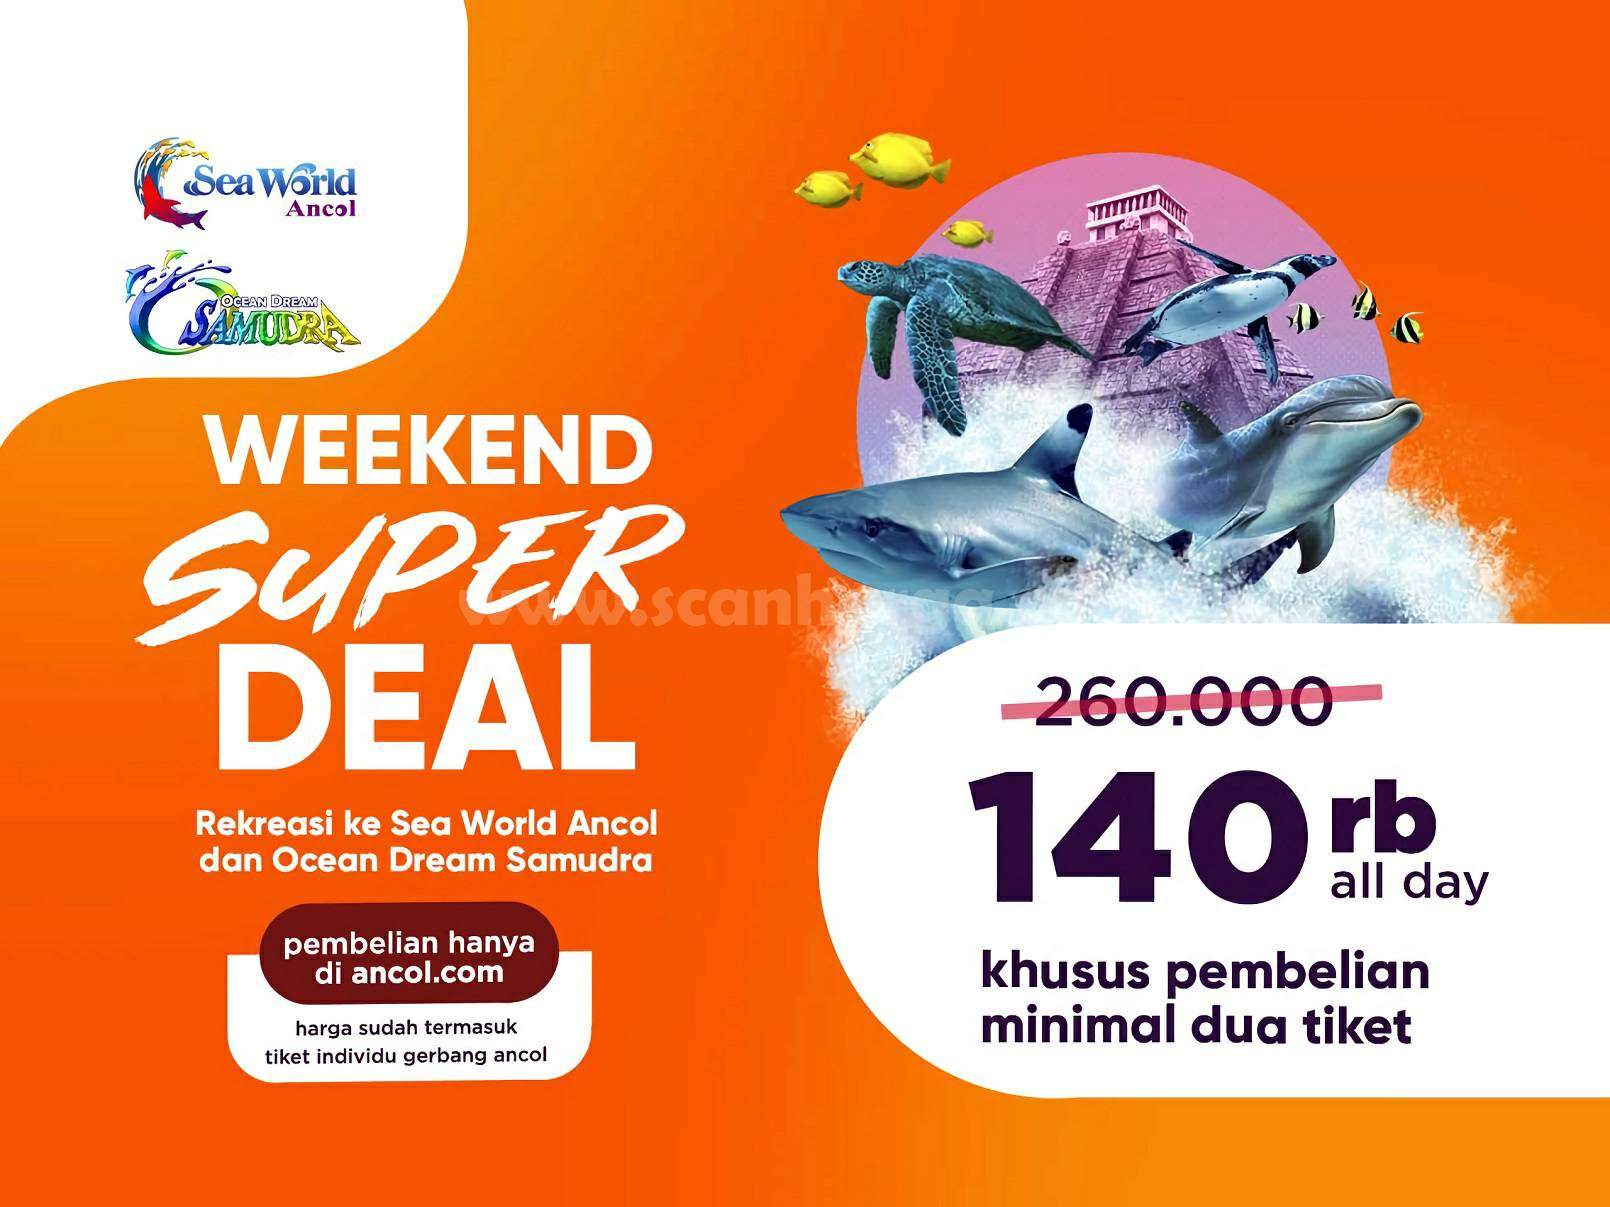 Ocean Dream Samudra Promo Weekend Super Deal Harga Cuma Rp. 140 Ribu